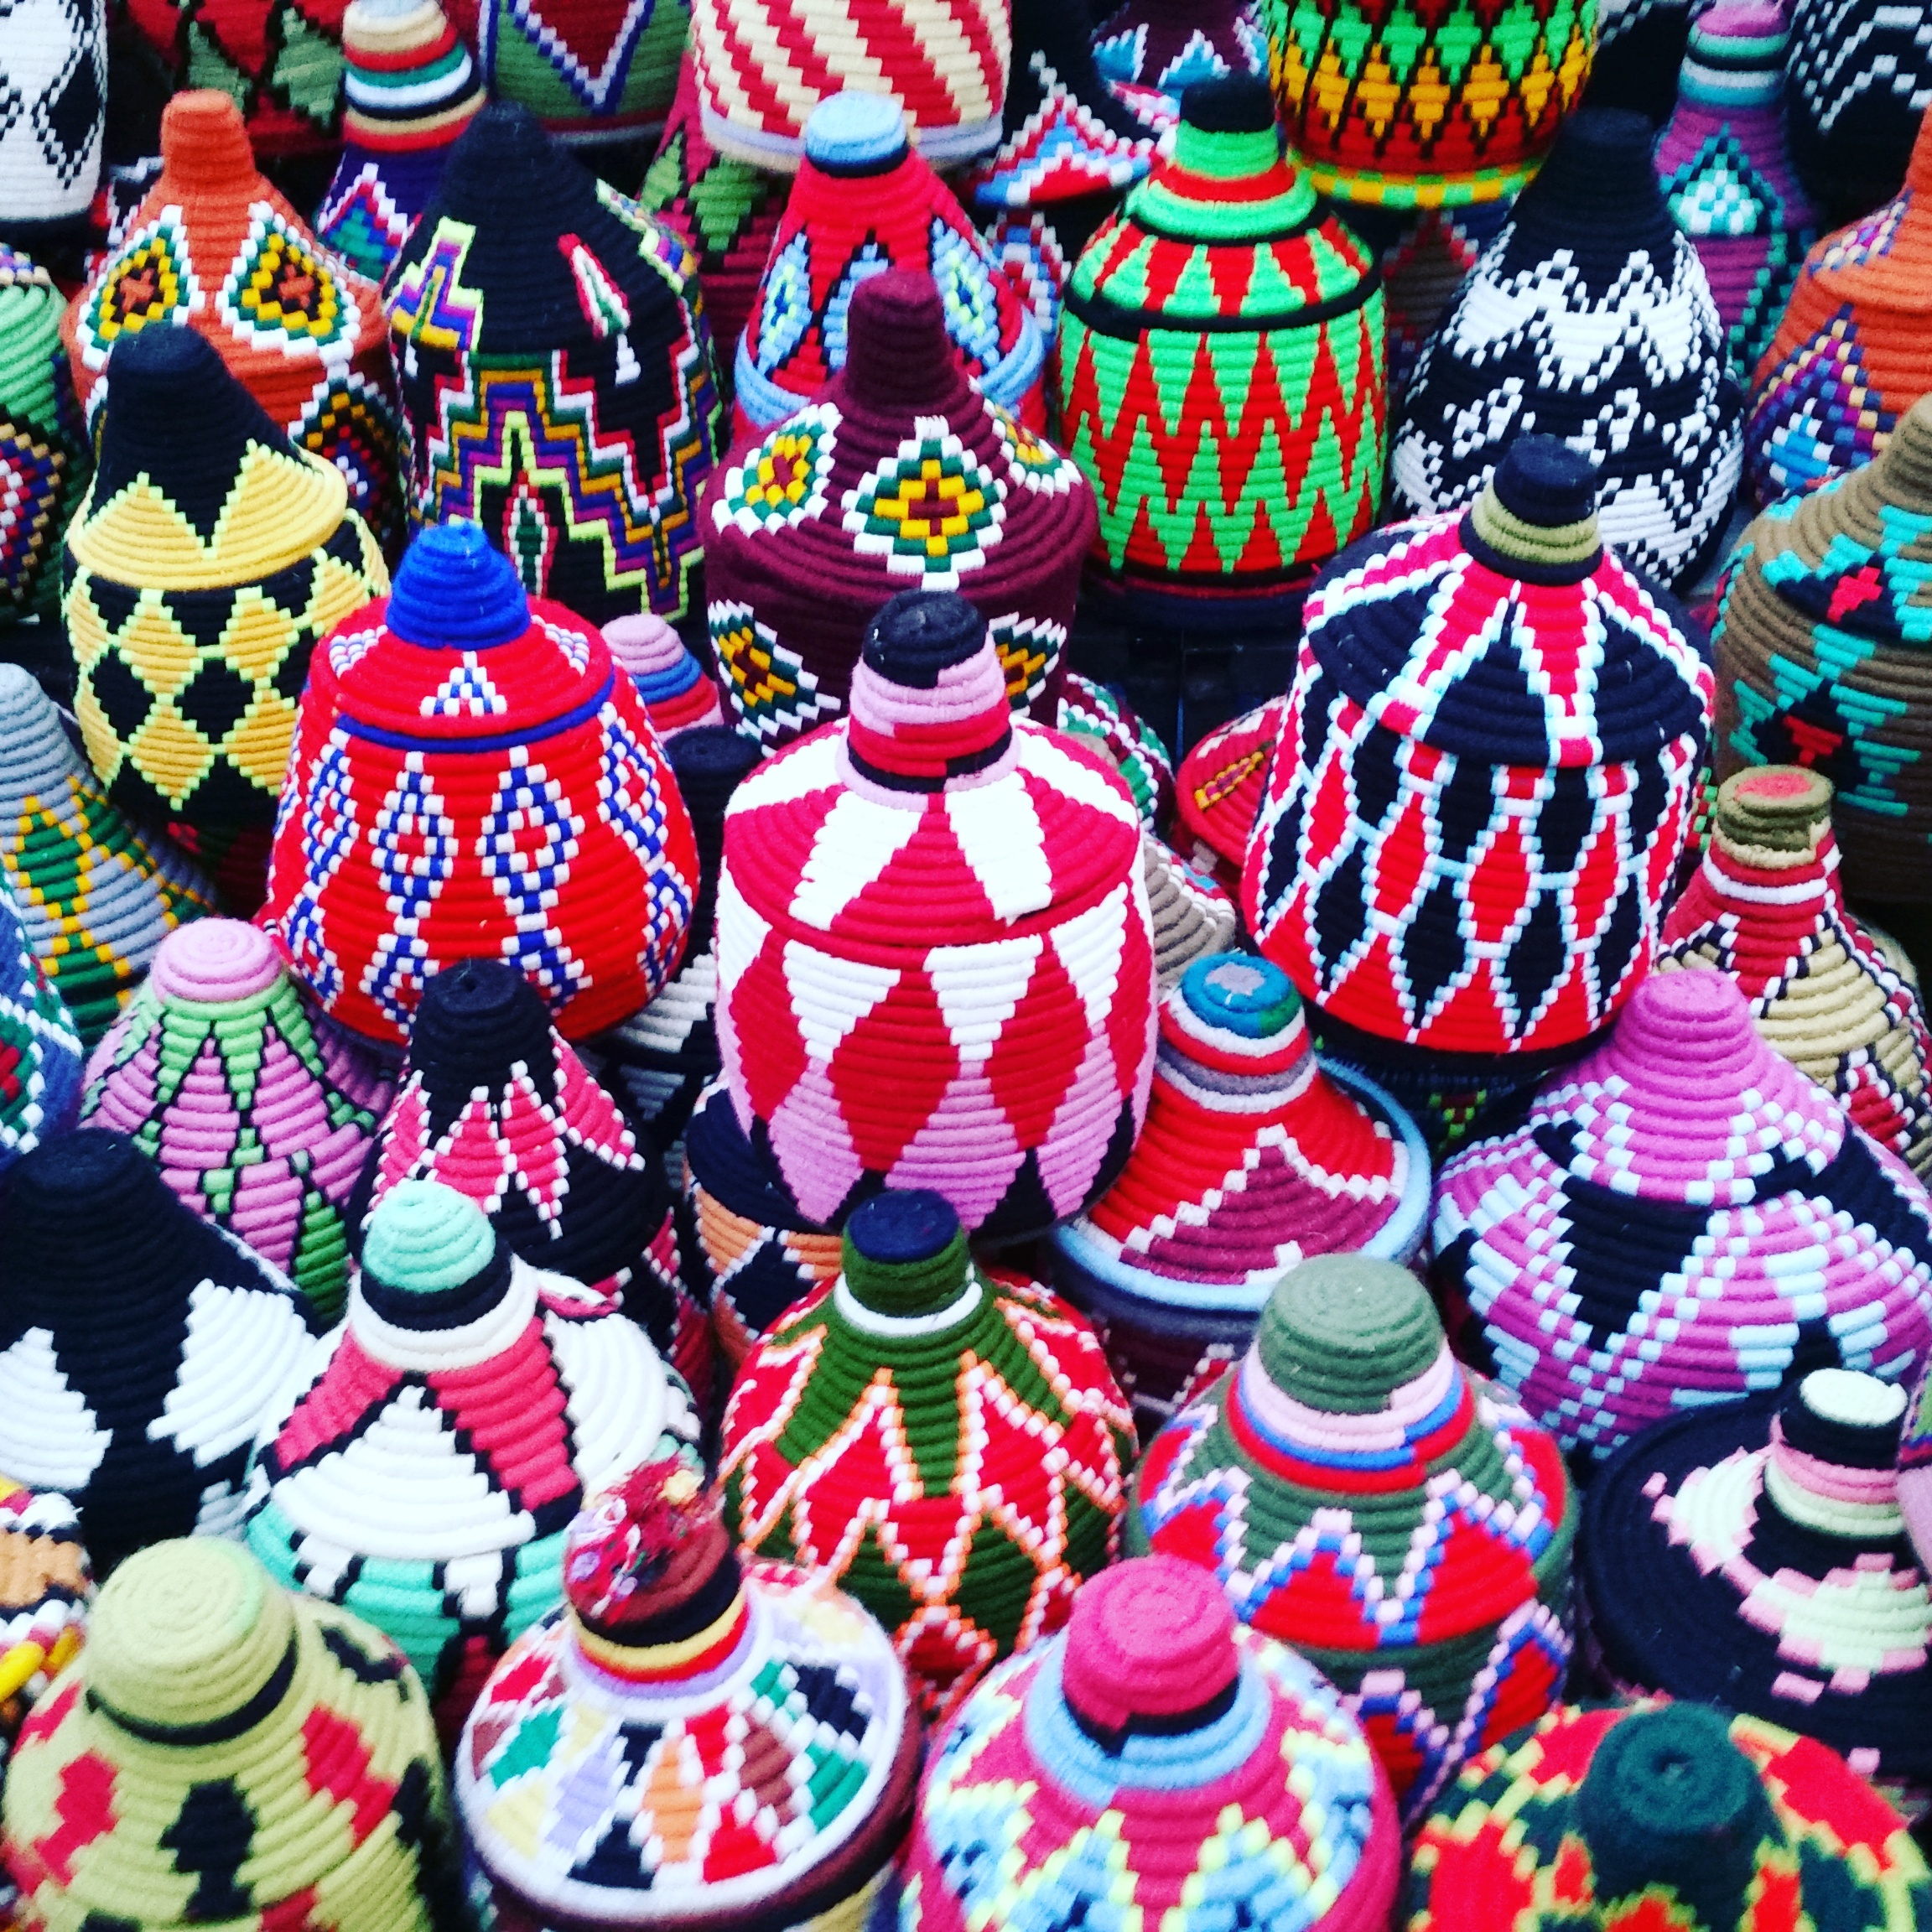 Handmade baskets in Marrakesh